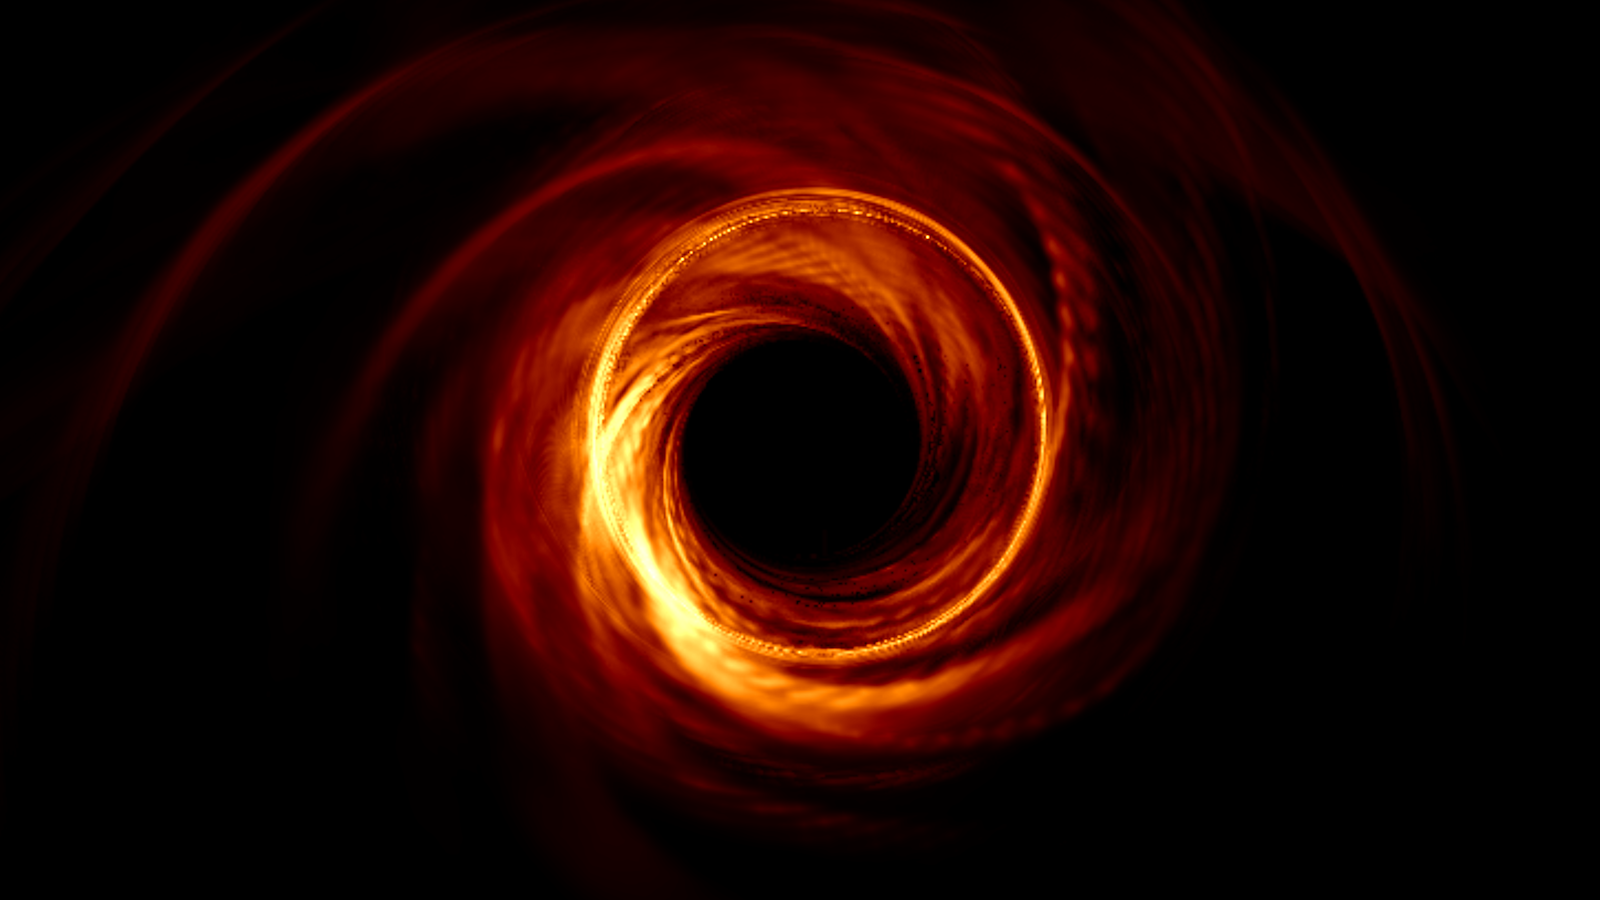 event horizon black hole picture